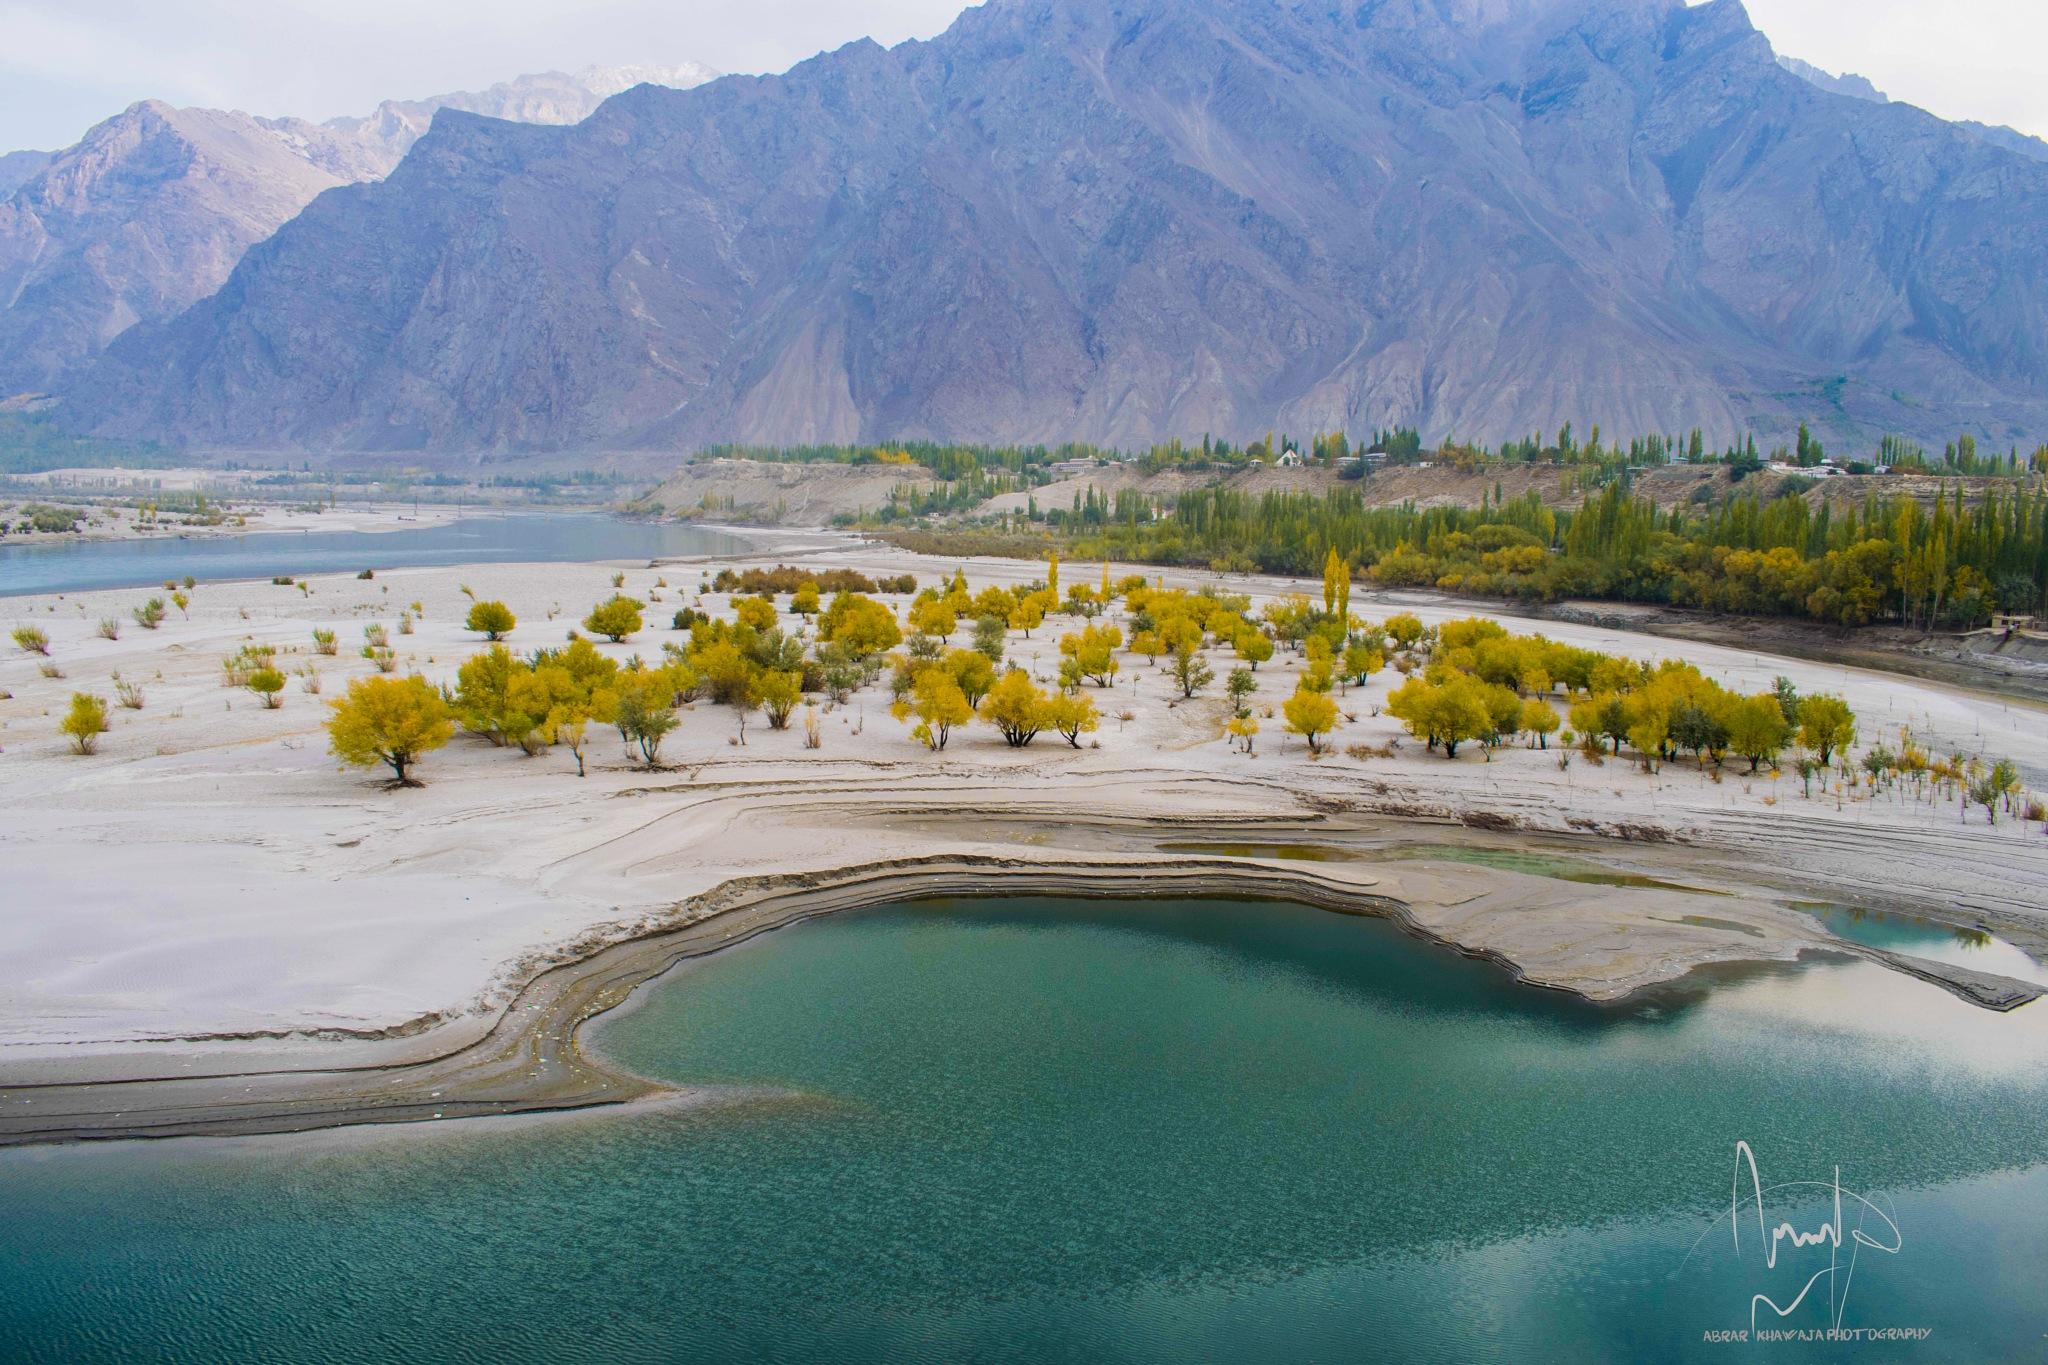 Indus River Skardu by Abrar khawaja